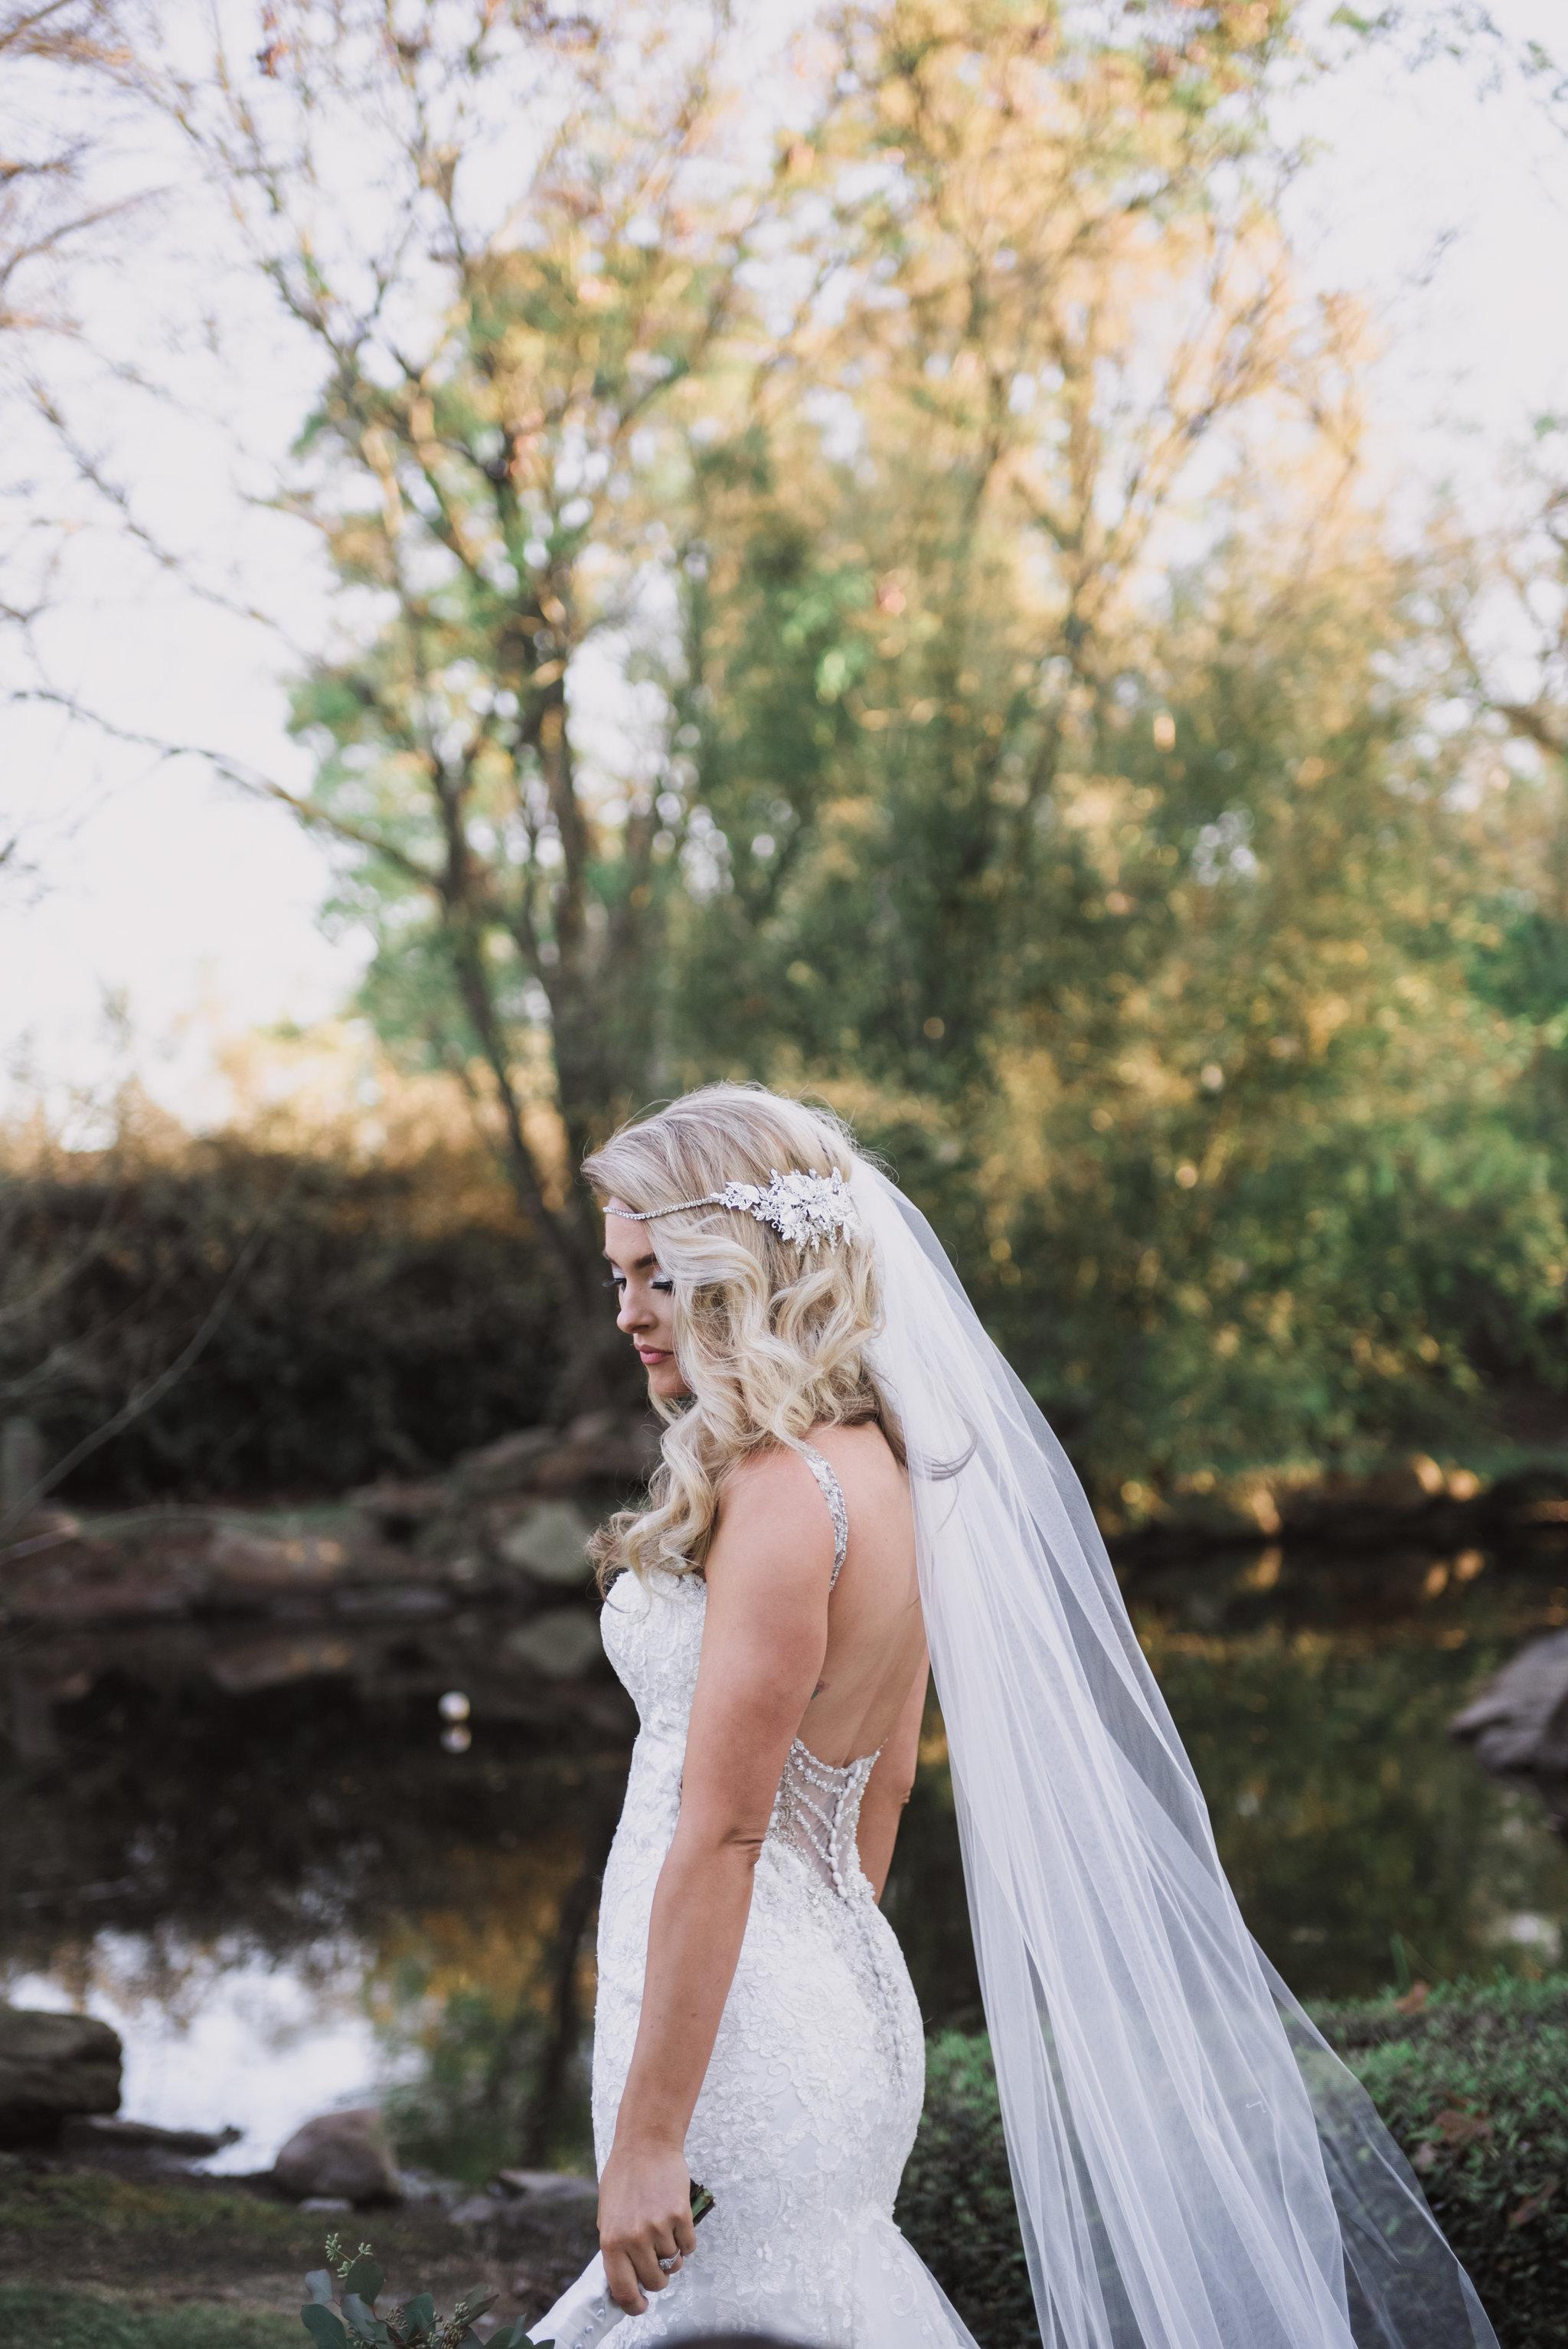 Ashley-Manor-Wedding-9498-3.jpg